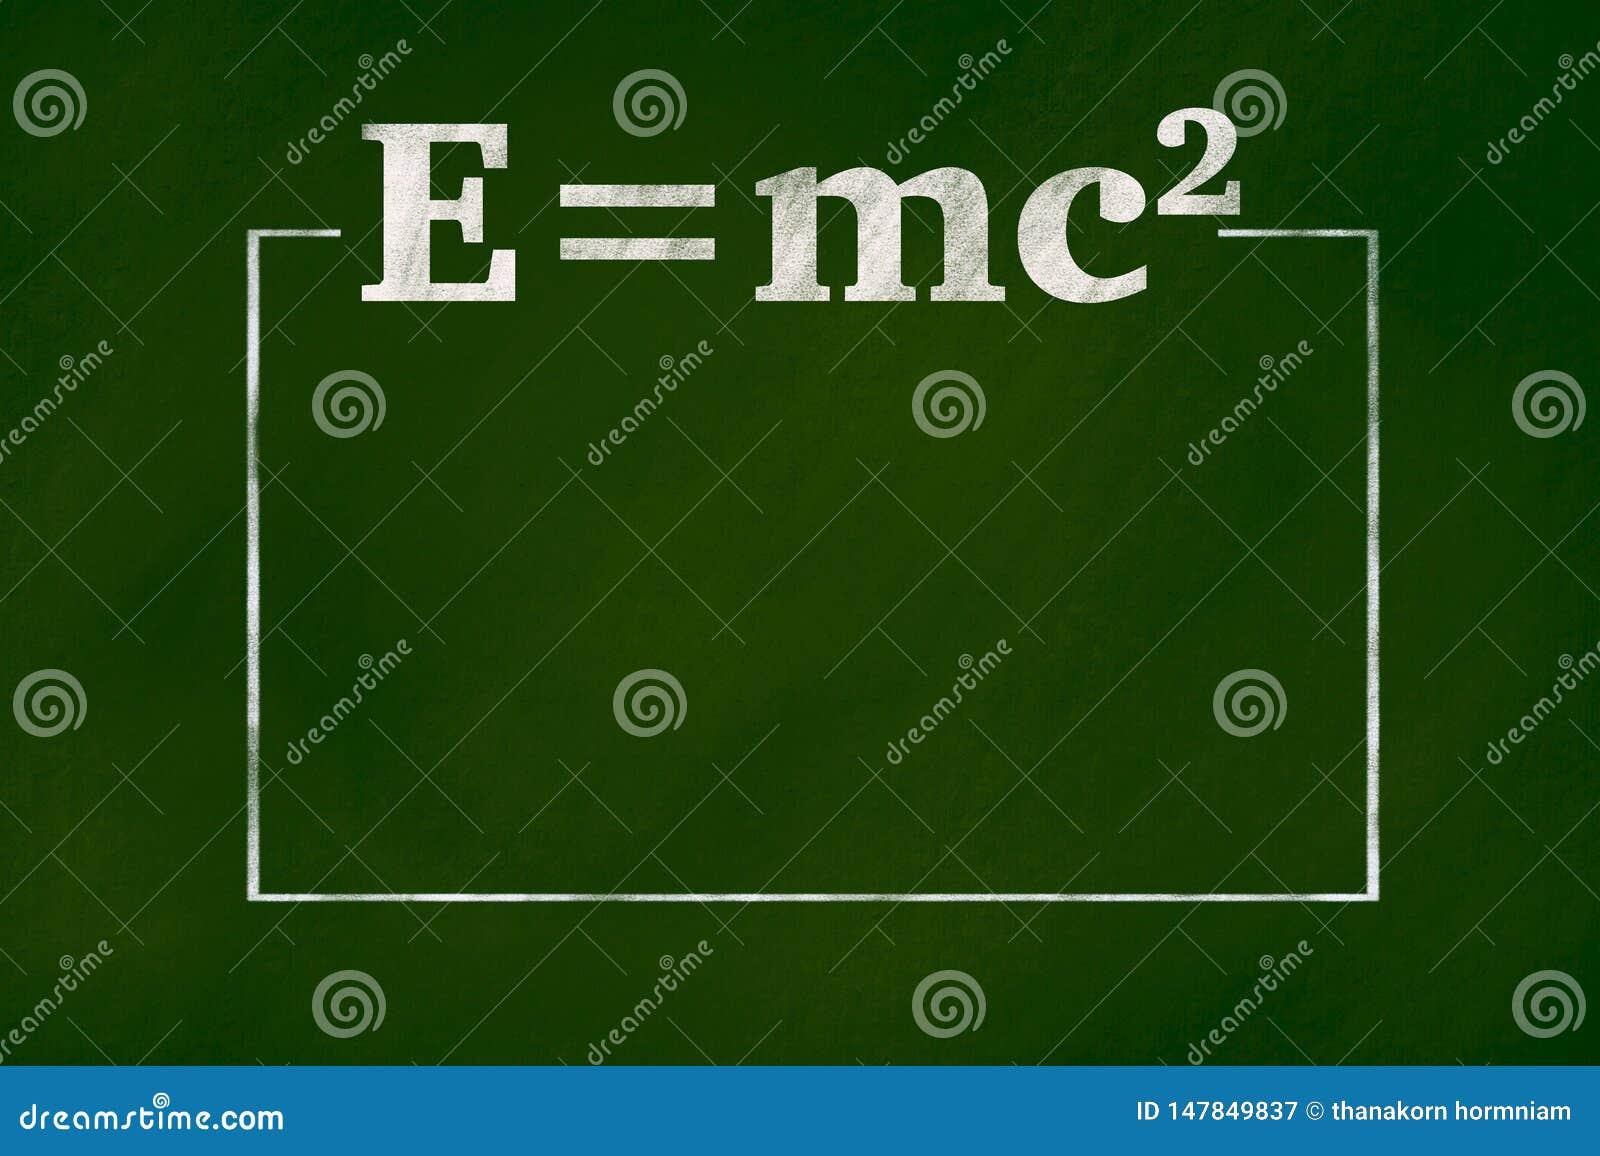 Mass-energy equivalent